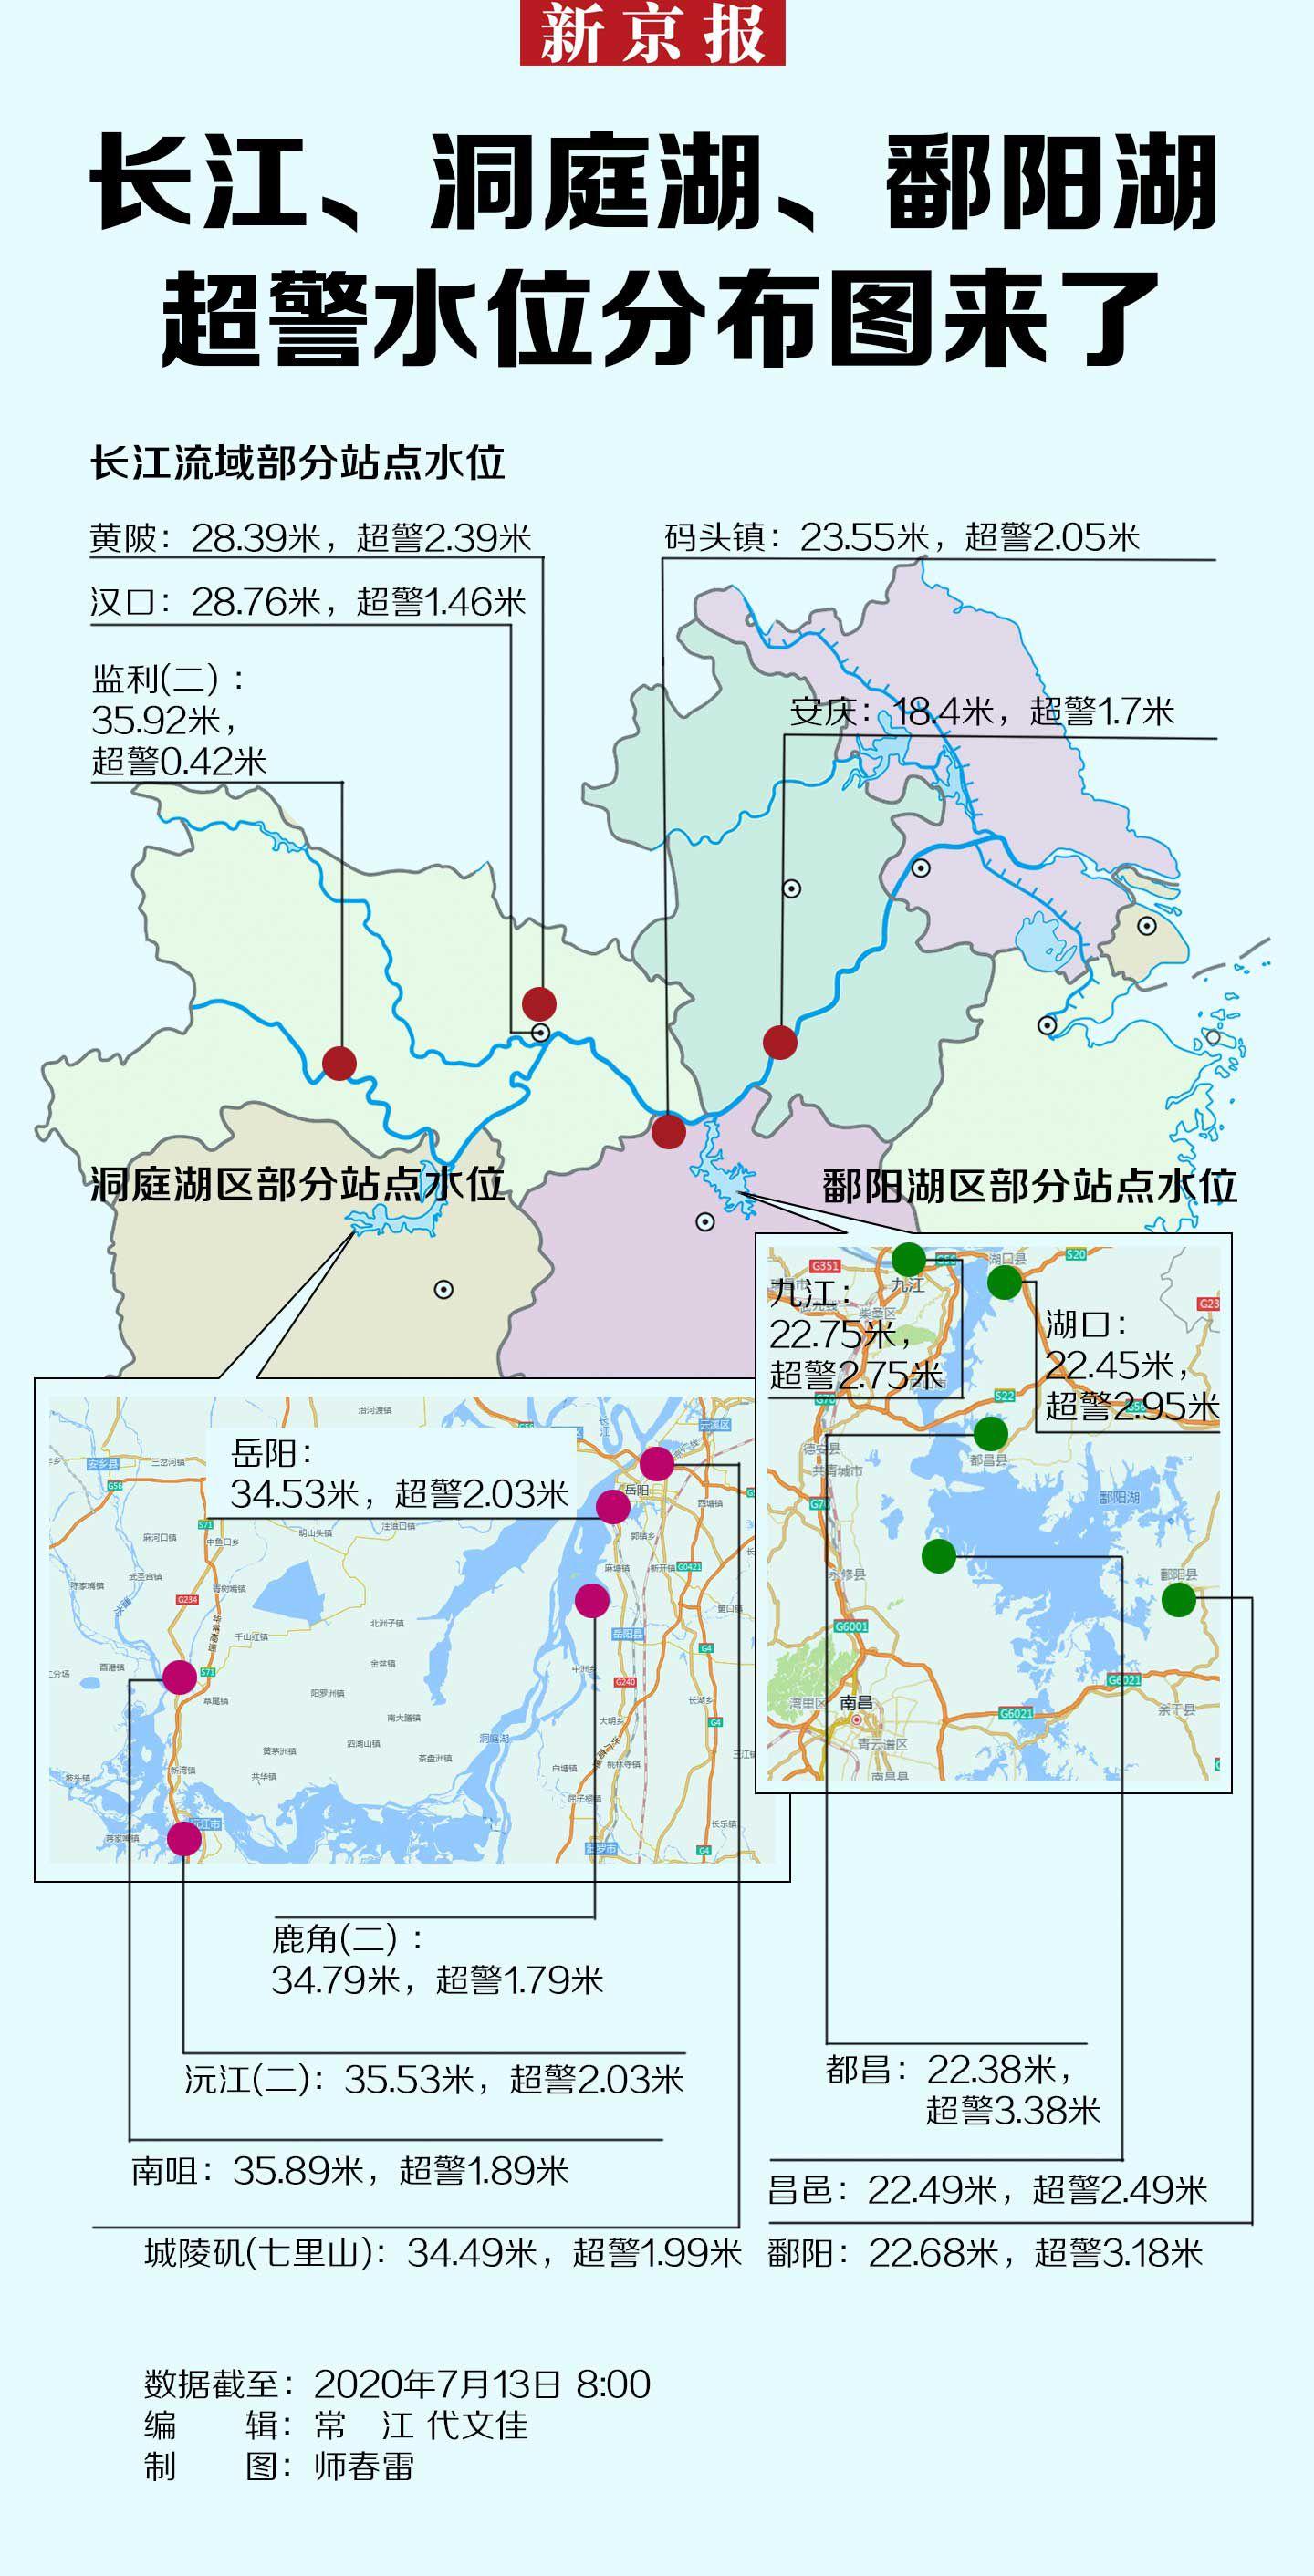 【google统计】_长江、洞庭湖、鄱阳湖超警水位分布图来了